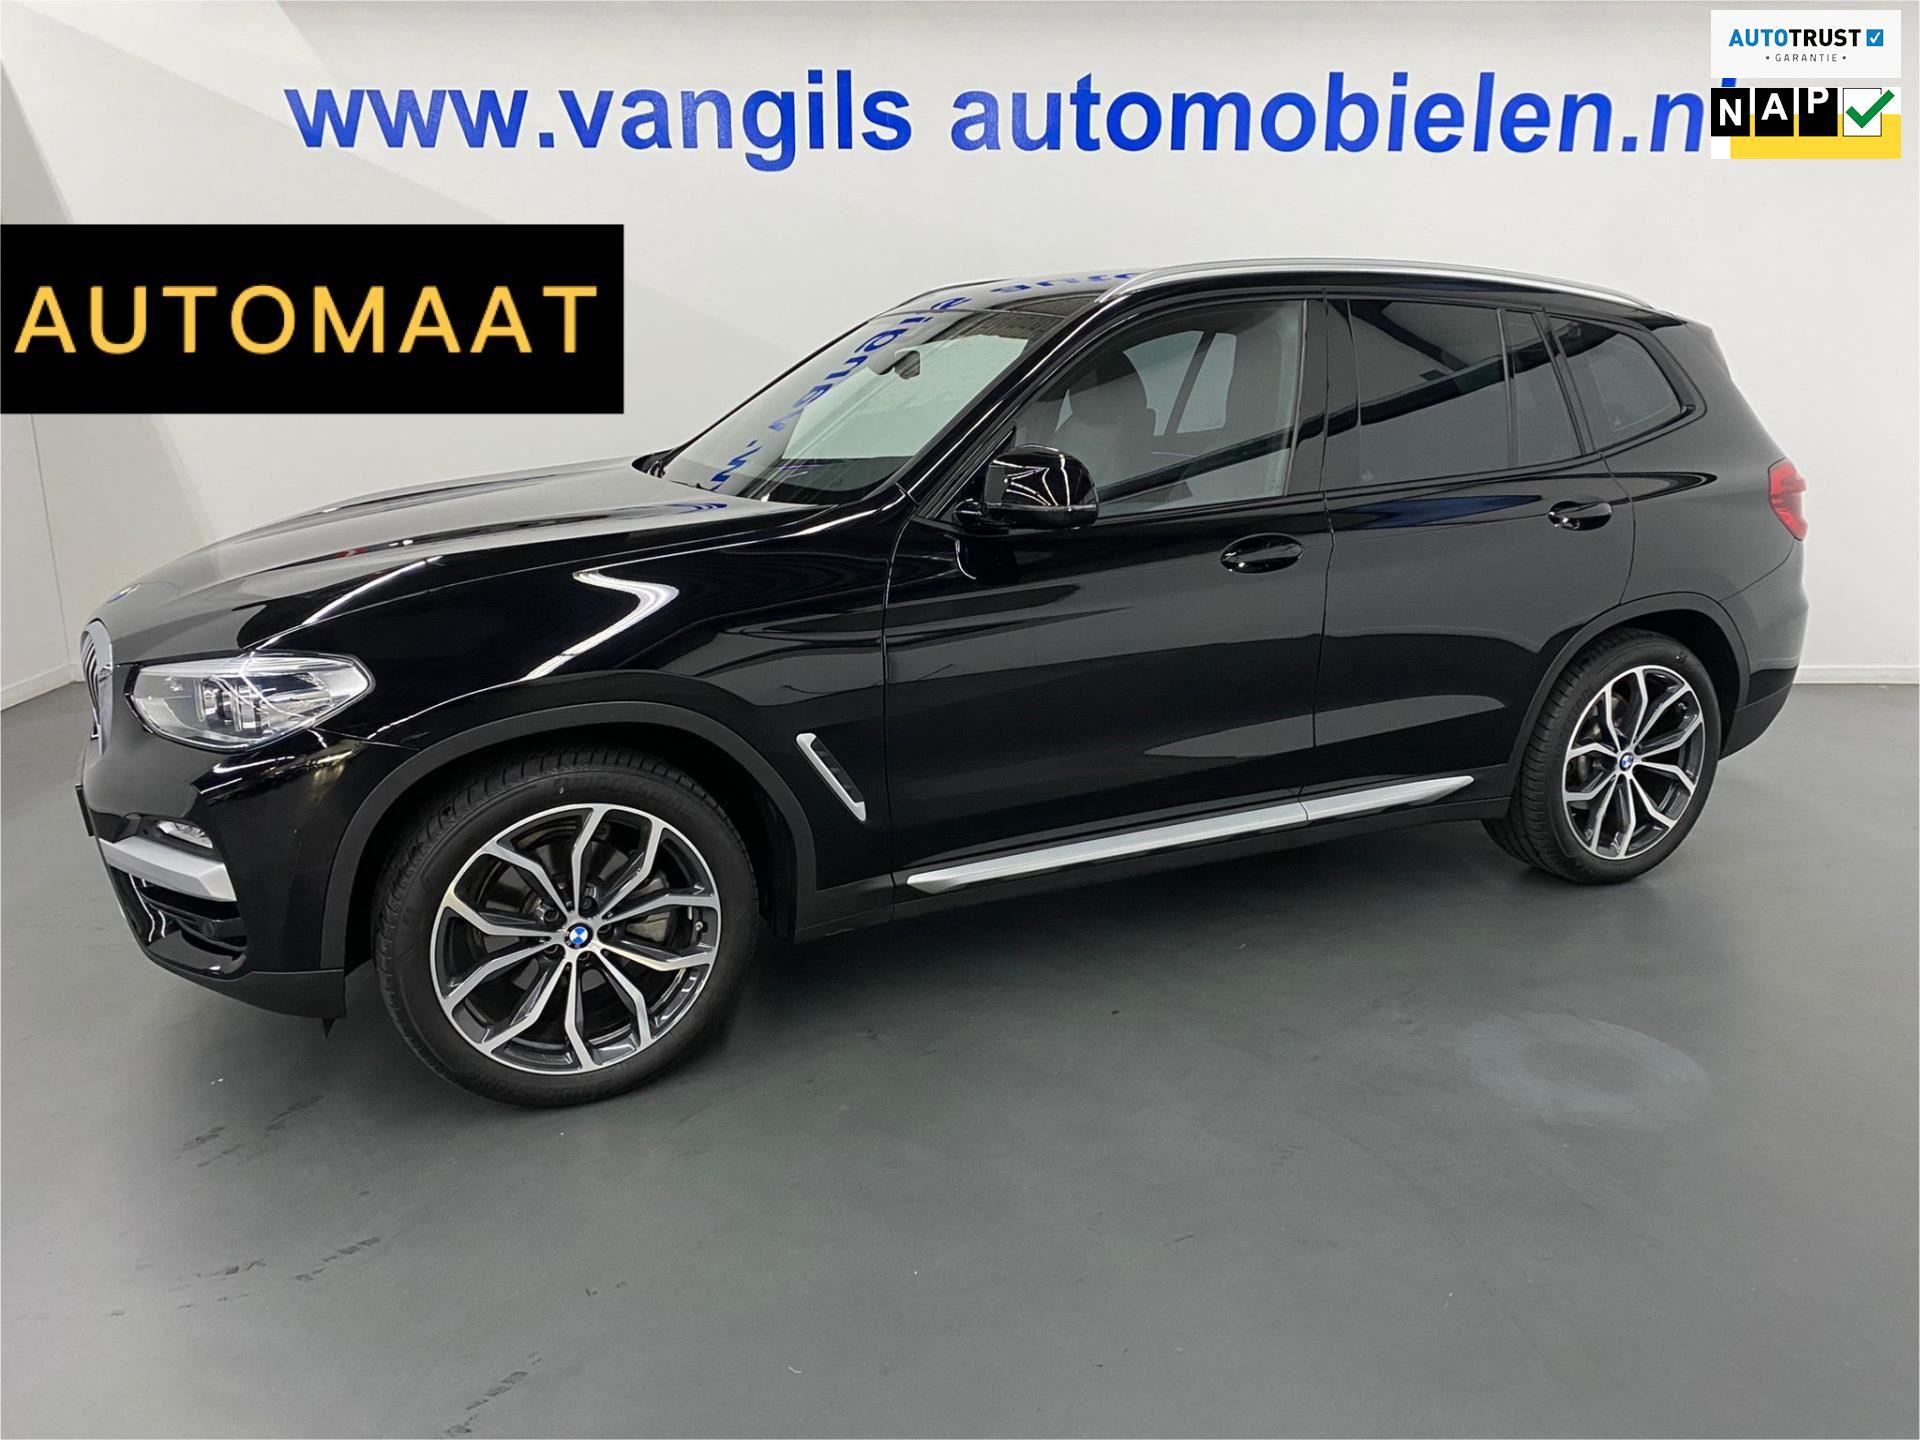 BMW X3 occasion - Van Gils Automobielen B.V.